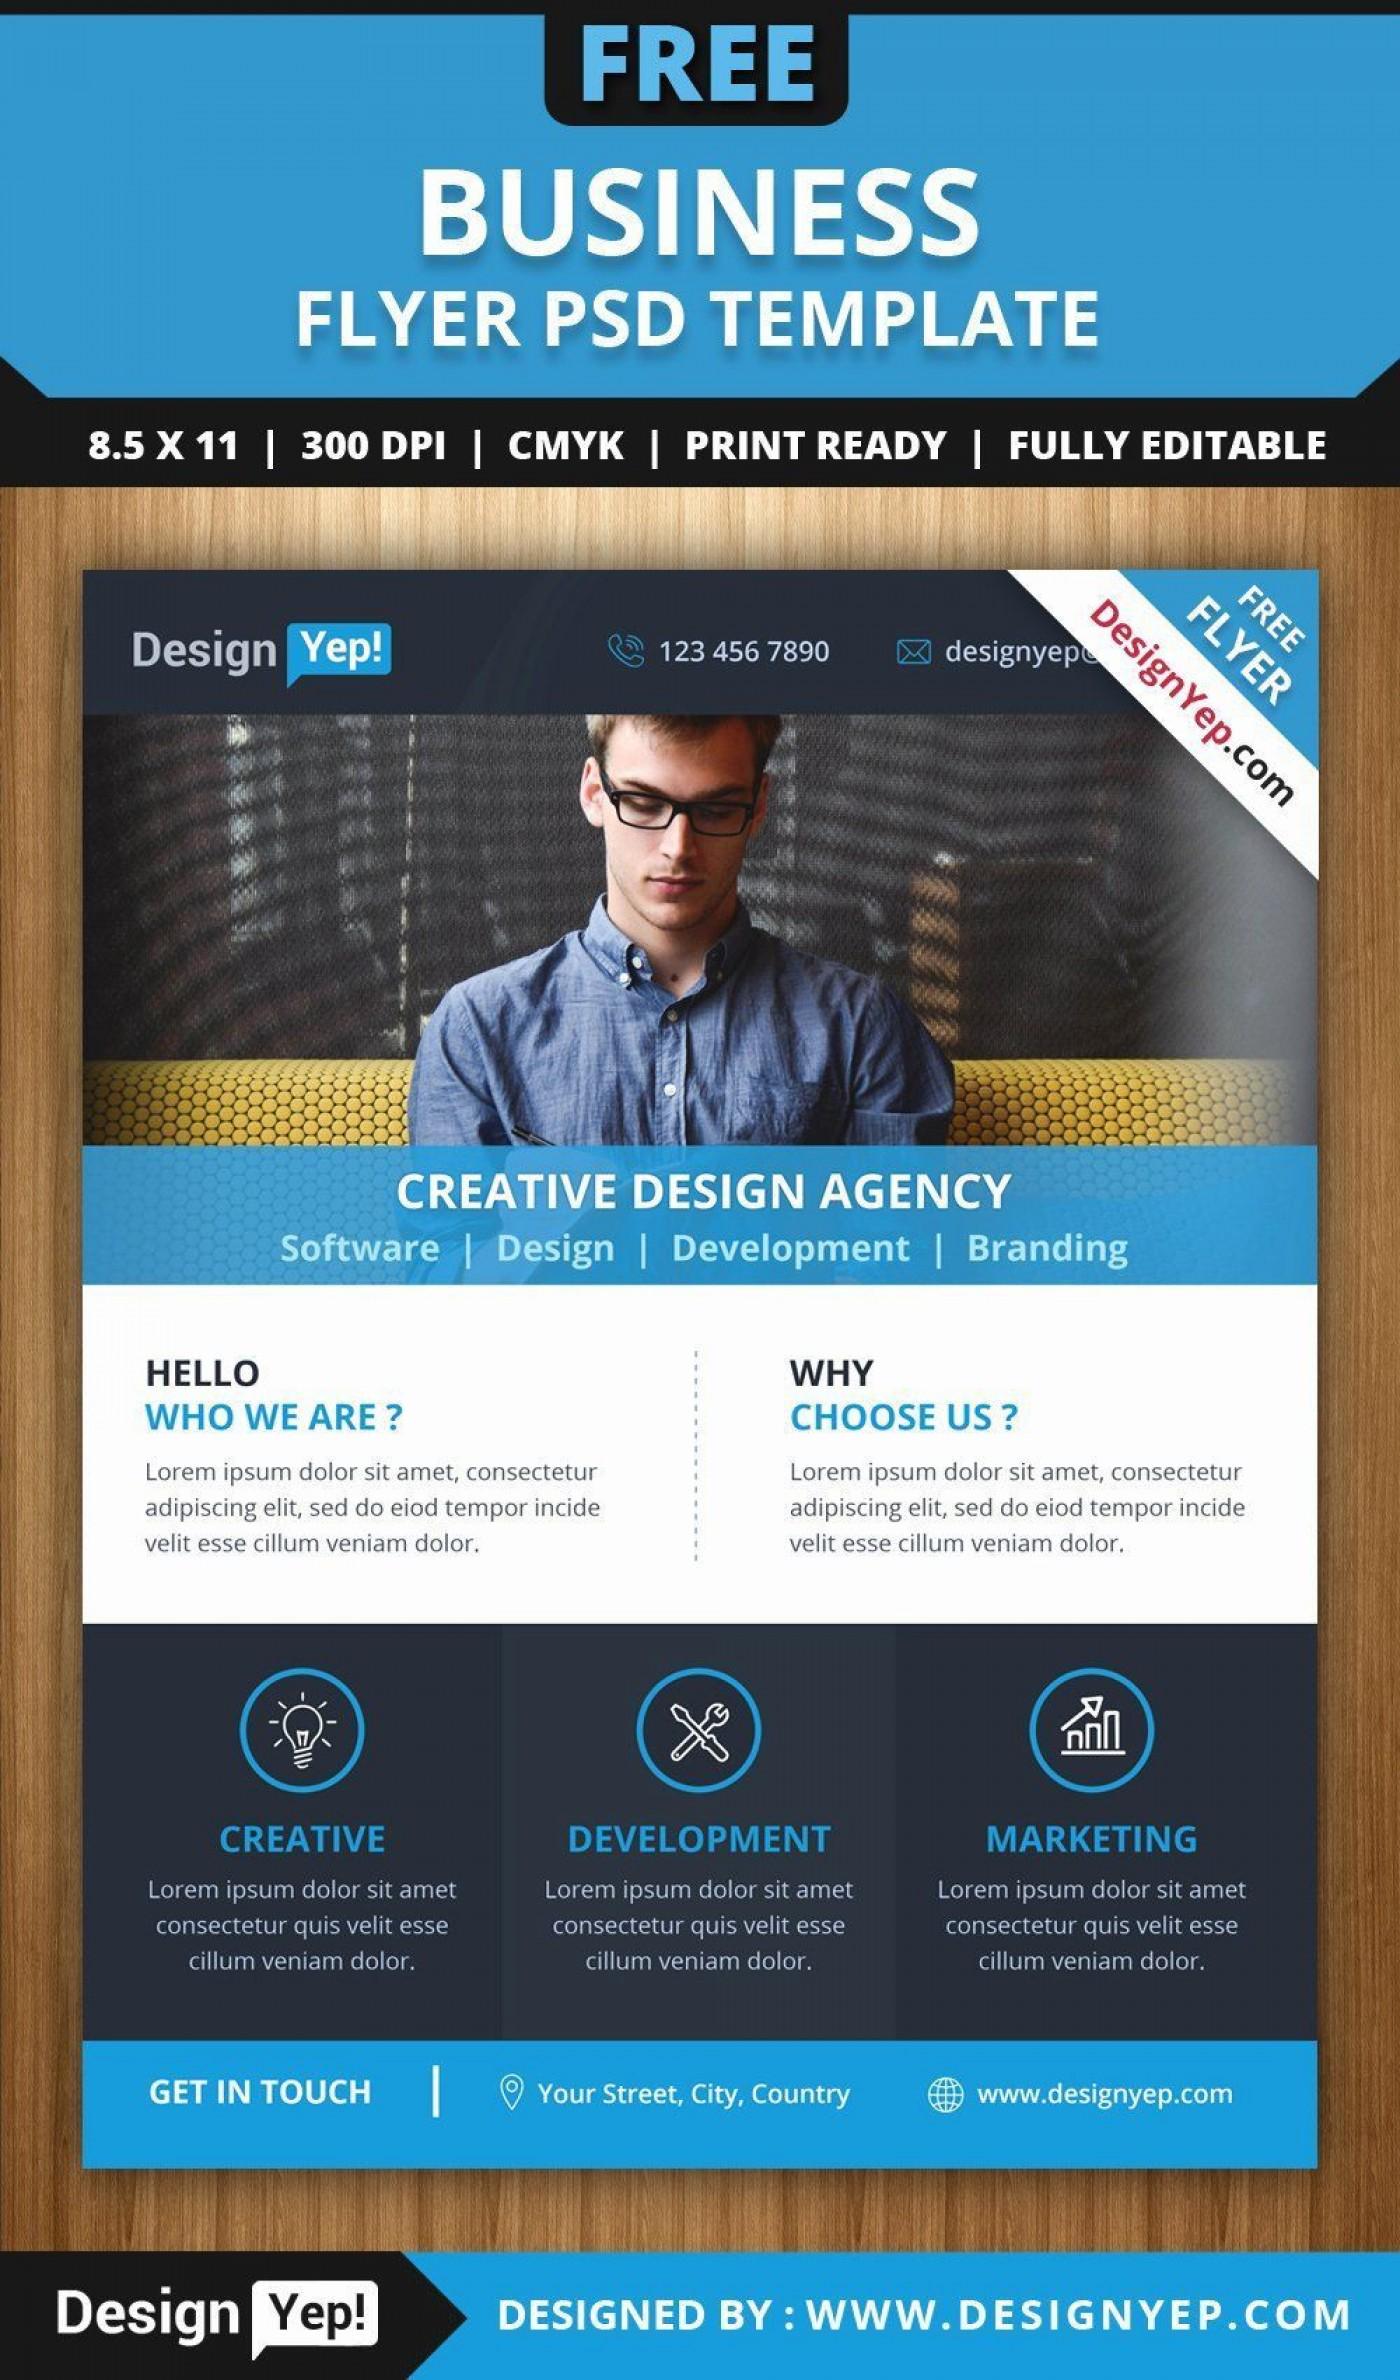 001 Singular Busines Flyer Template Free Download Concept  Photoshop Training Design1400